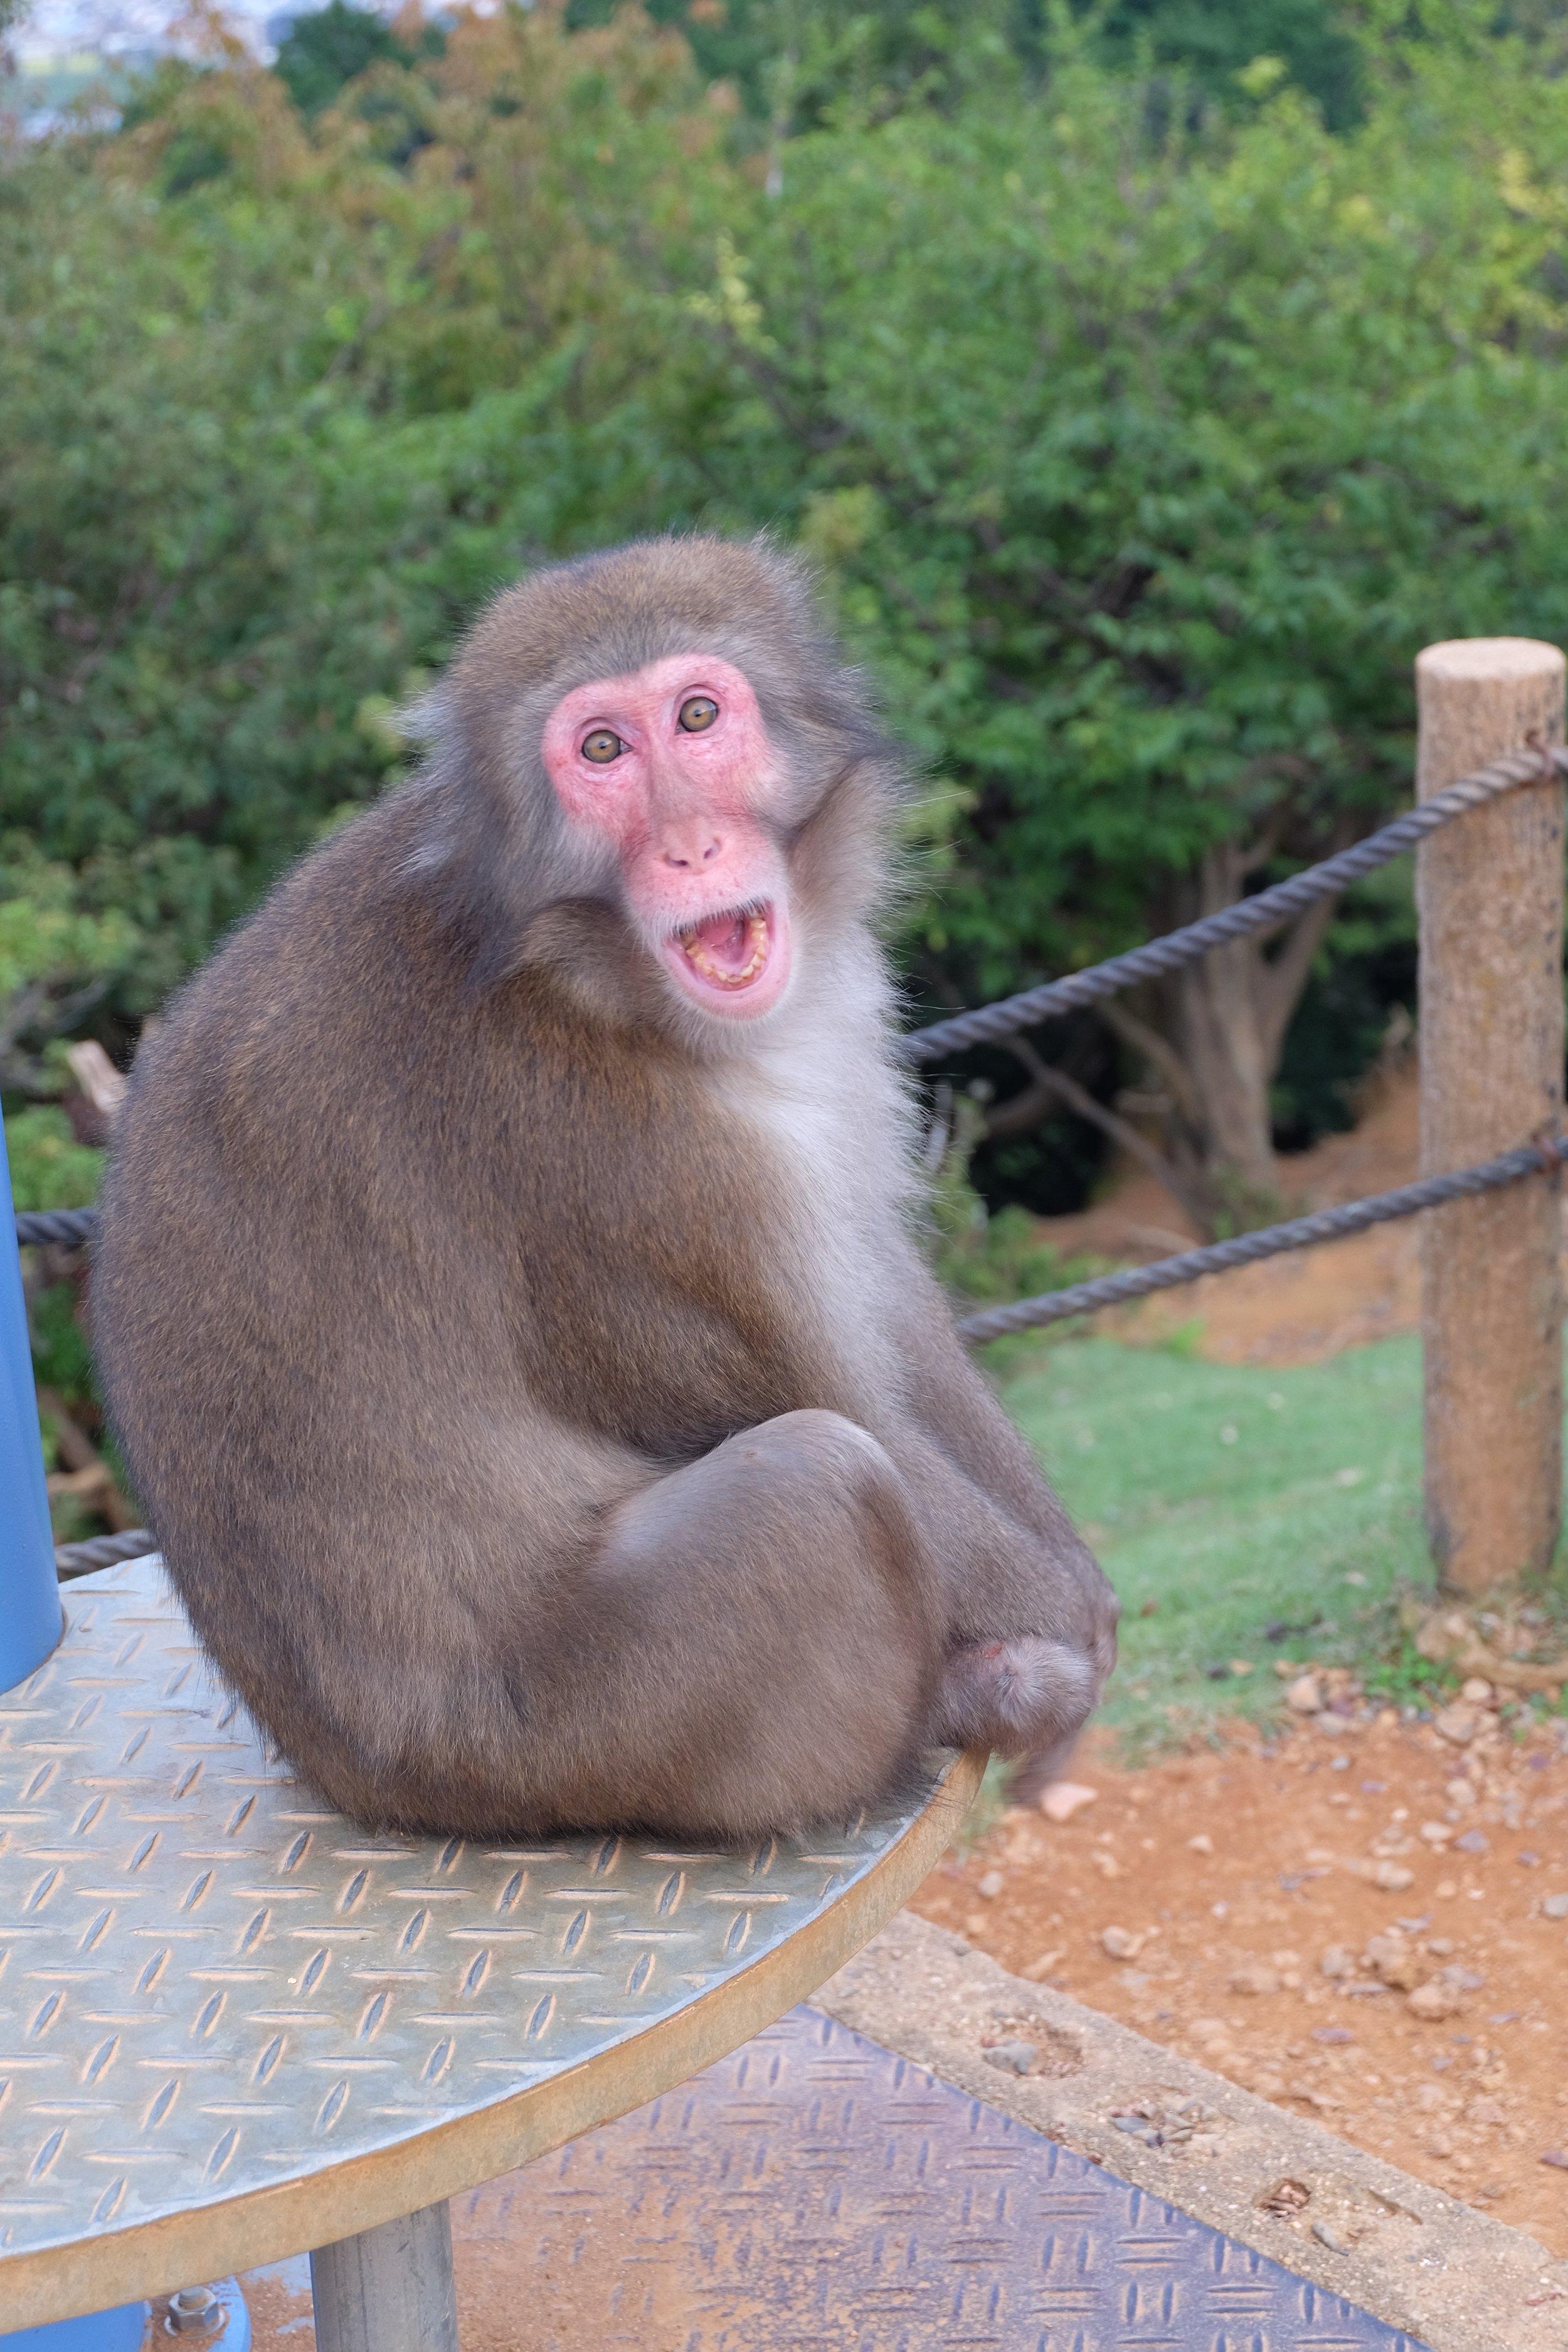 Meeting monkeys at Iwatayama